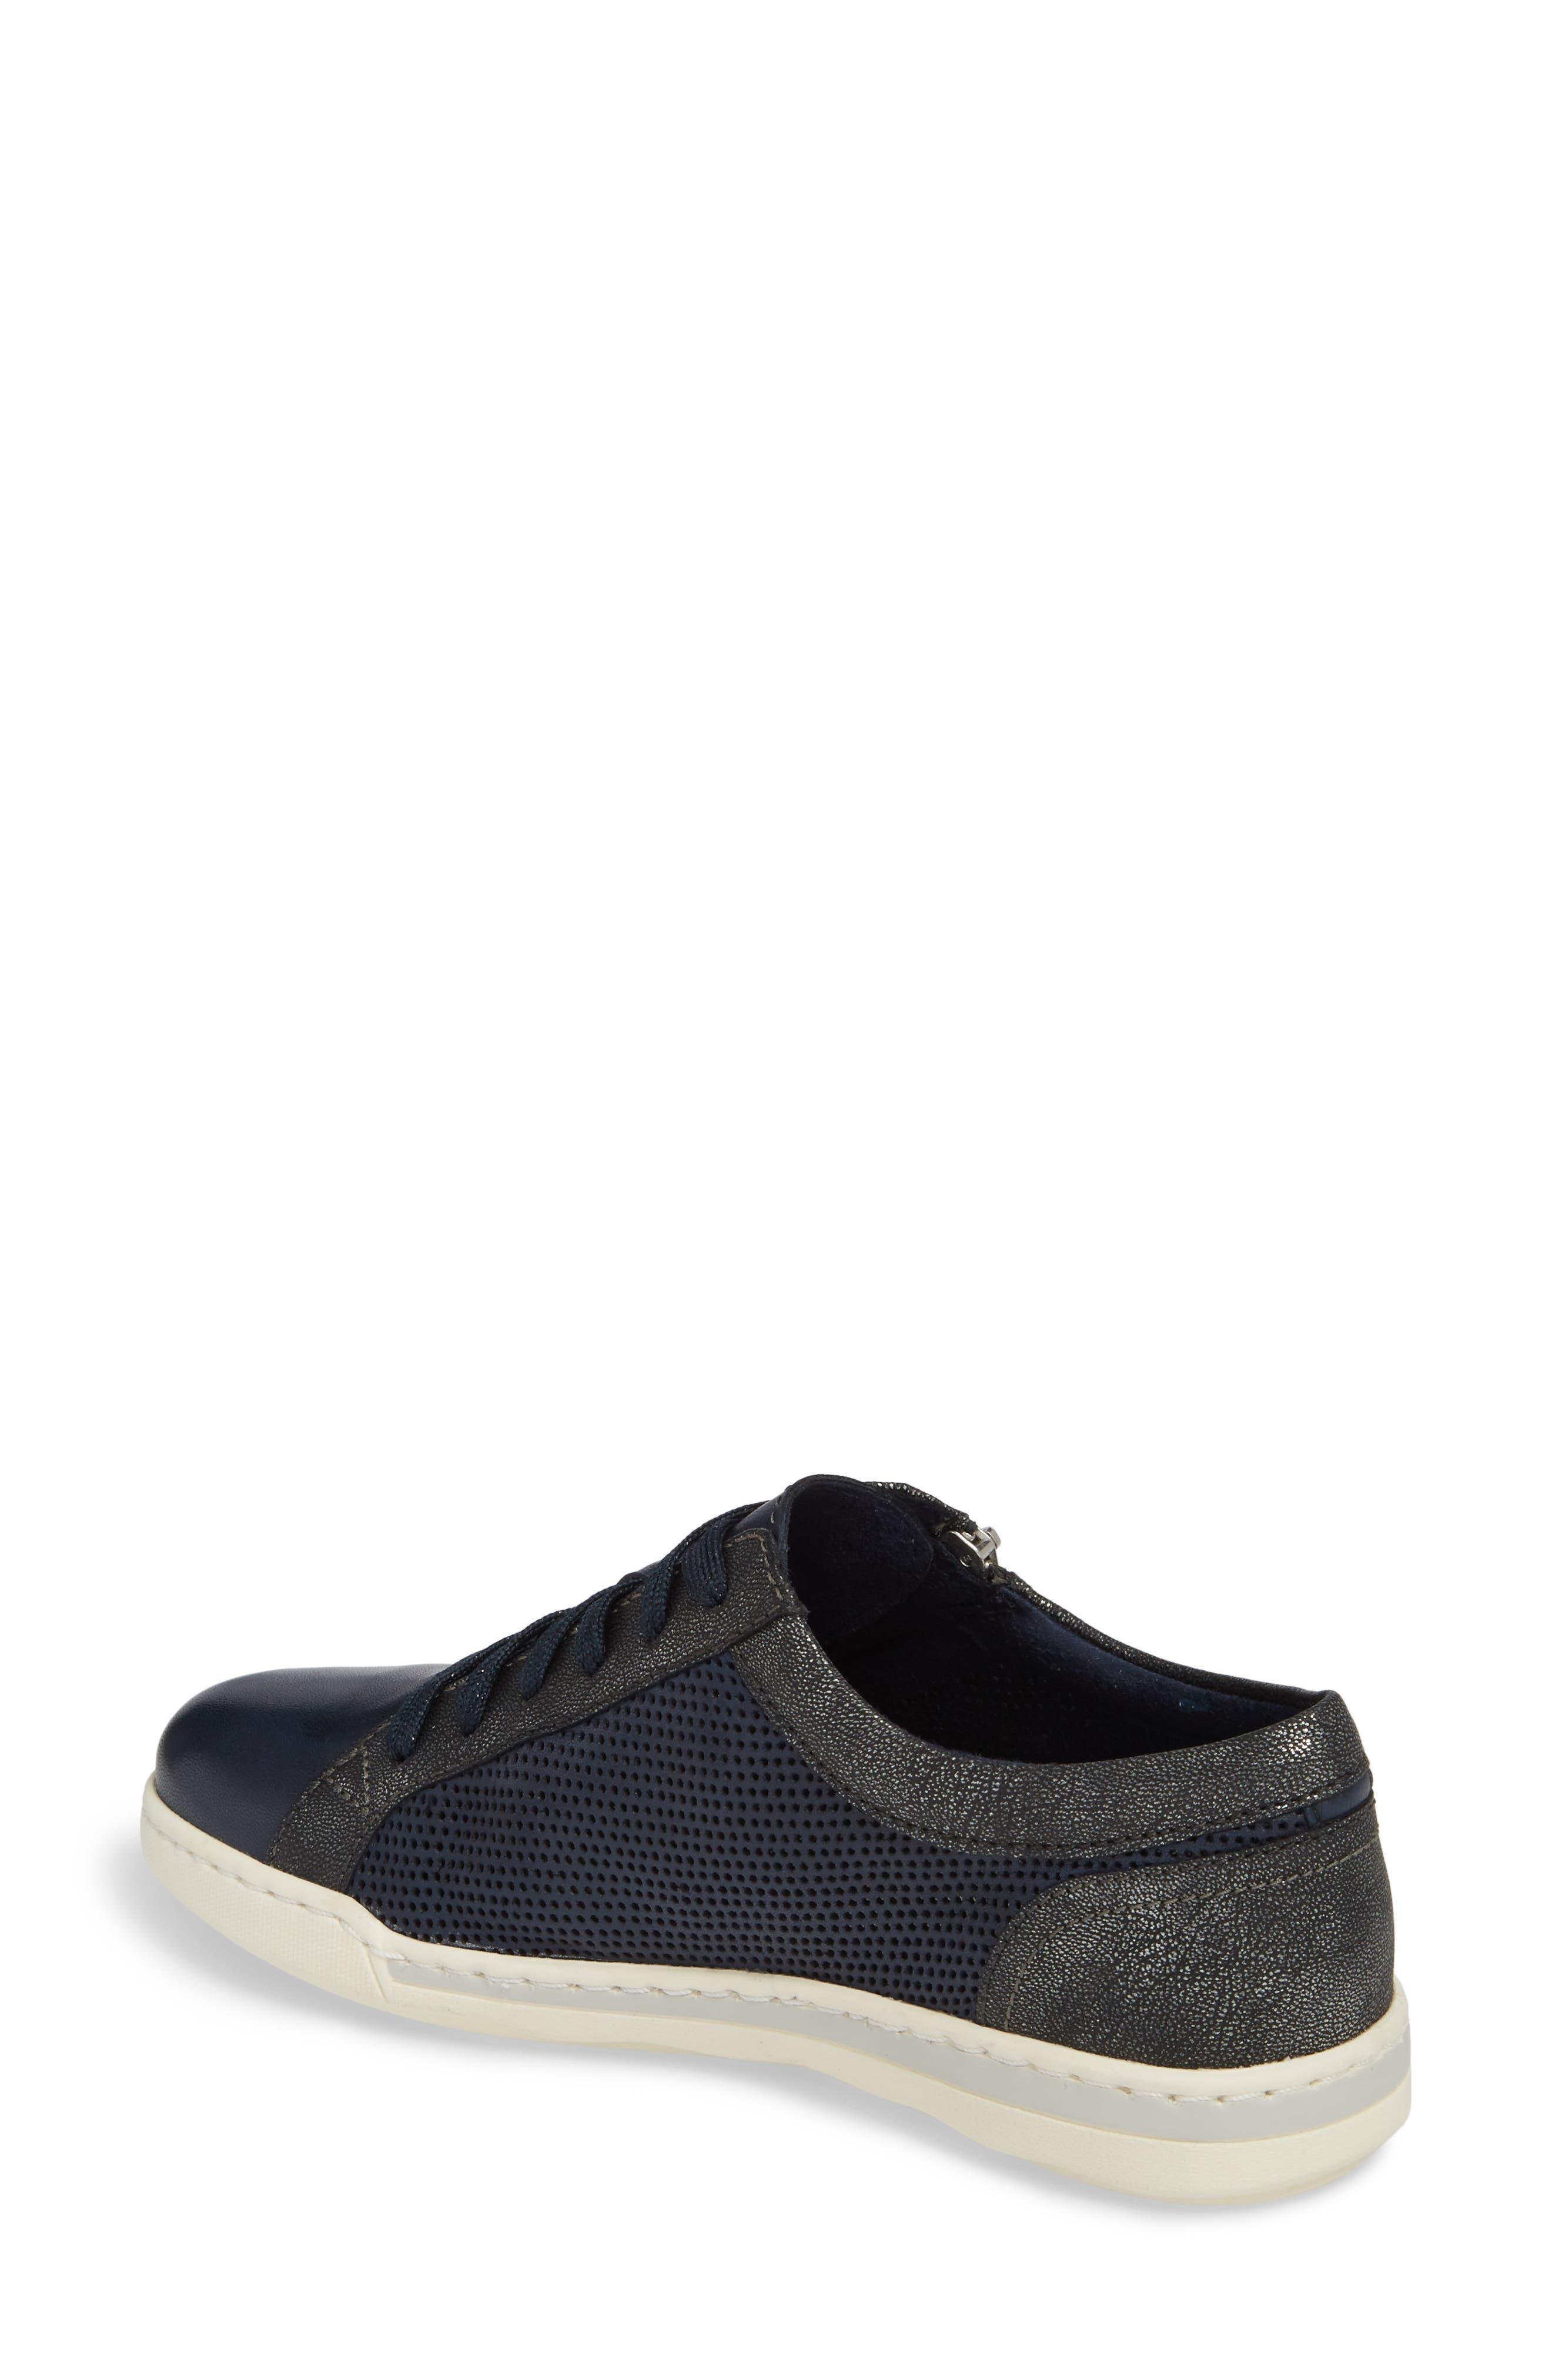 Freya Sneaker,                             Alternate thumbnail 2, color,                             Navy Leather